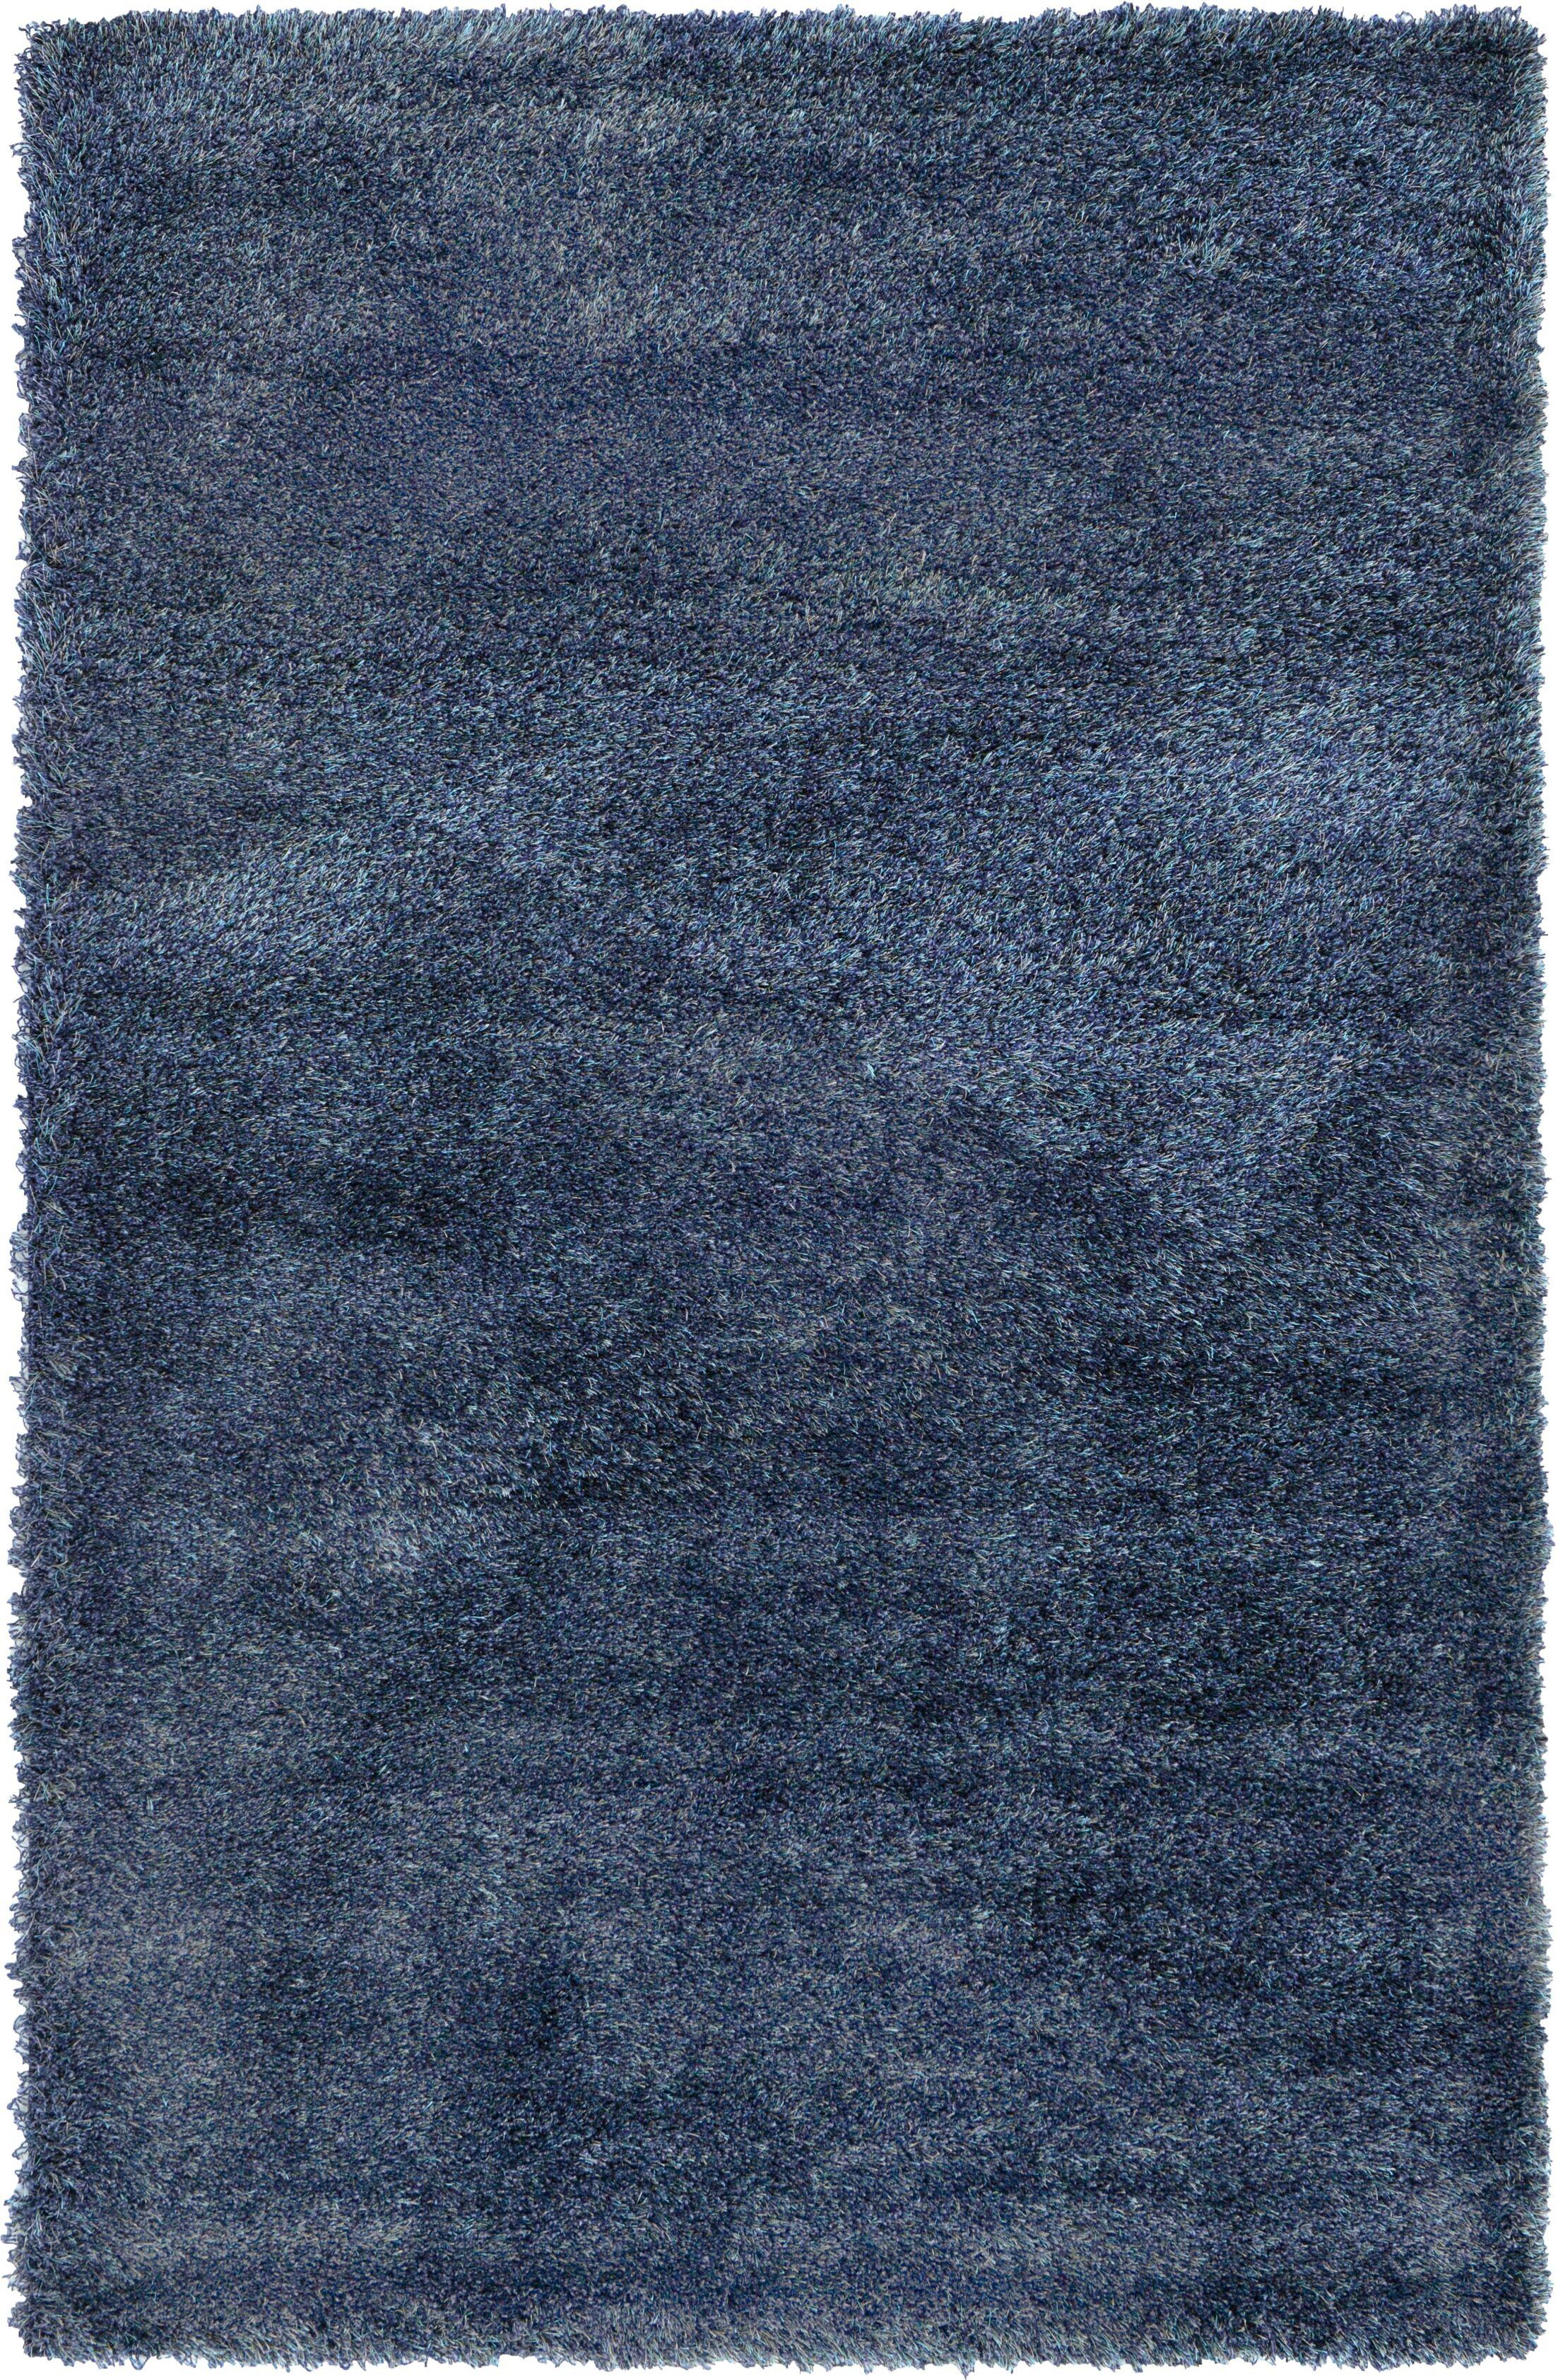 Evelyn Navy Blue Area Rug Rug Size: Rectangle 5' x 8'